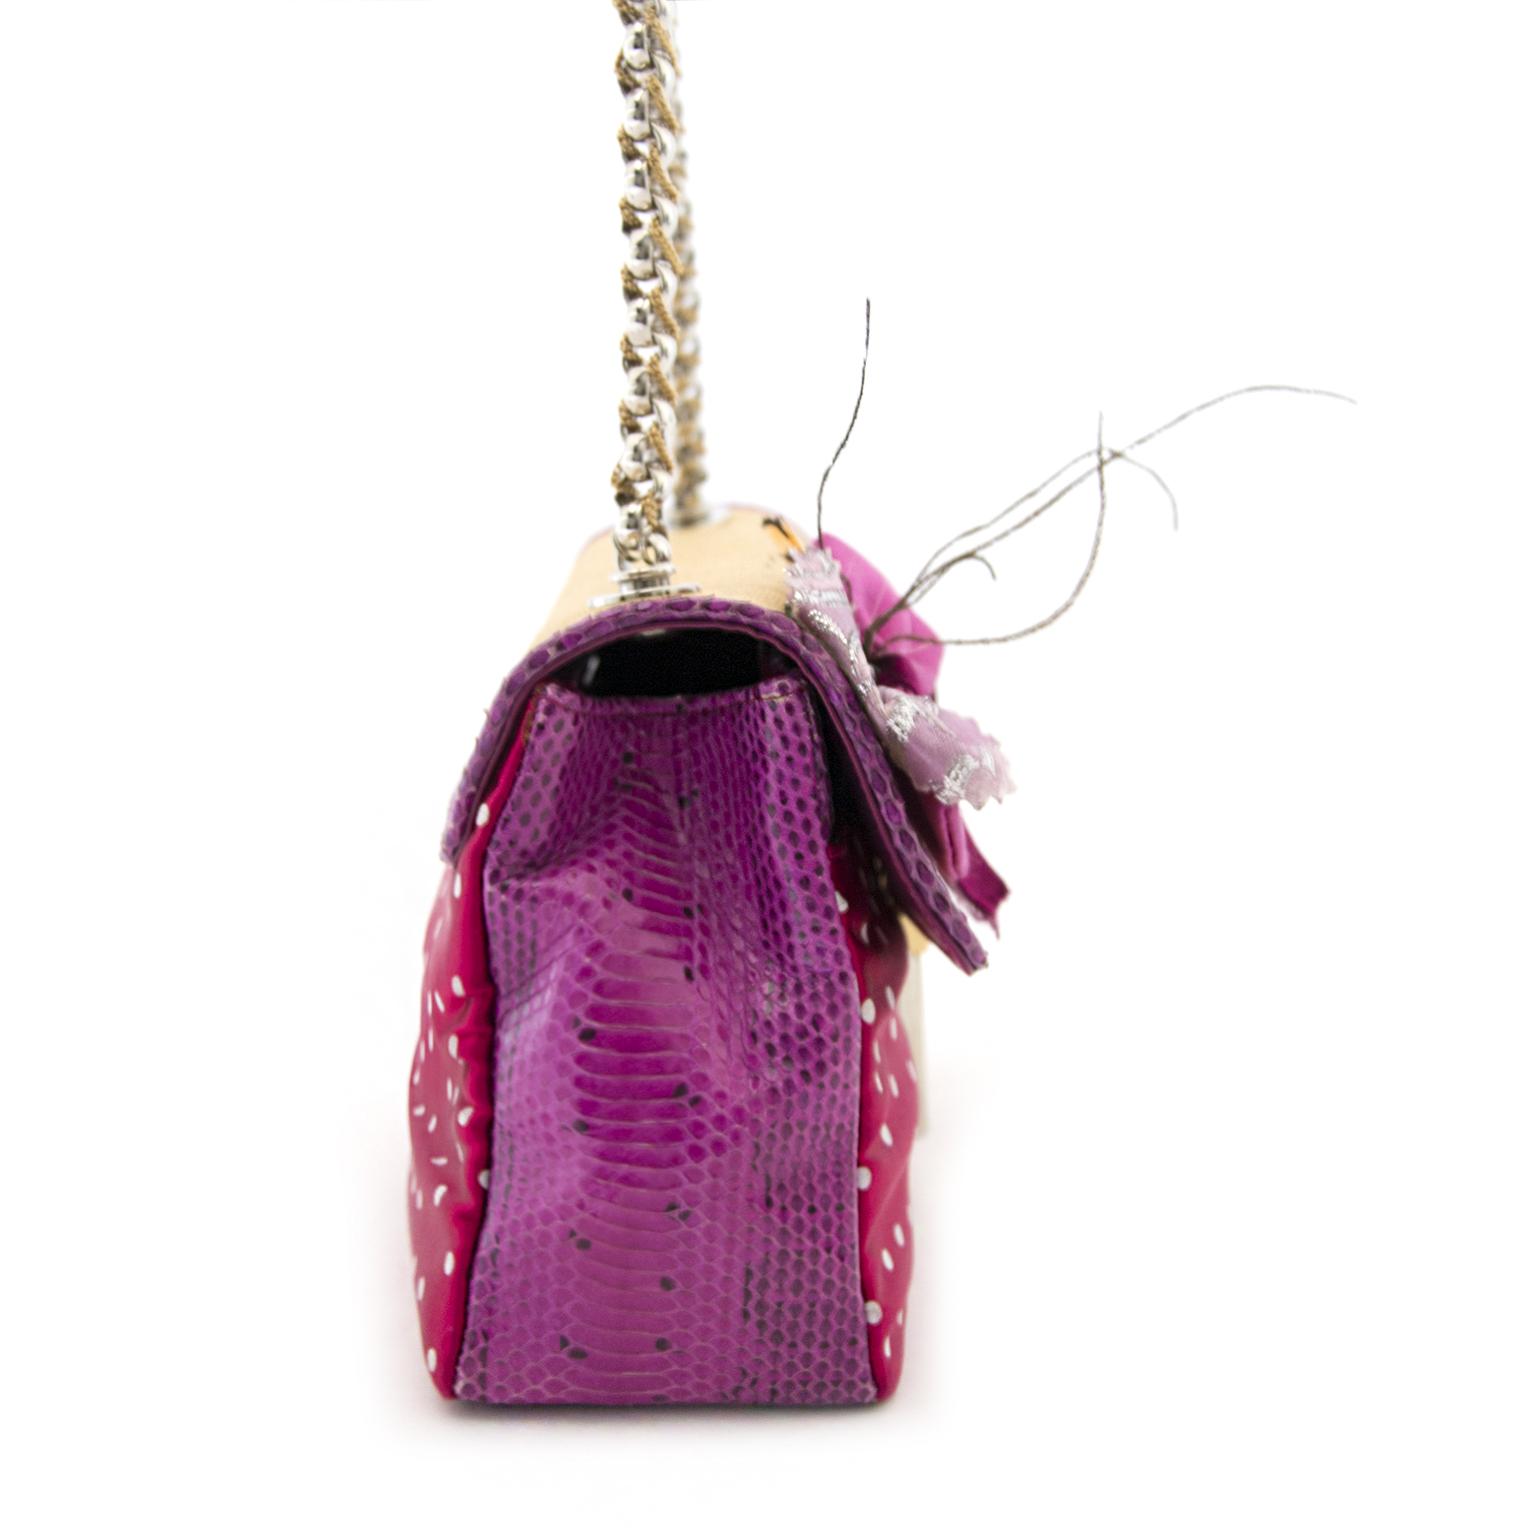 dolce & gabbana pink snake polkadot bag now online at labellov.com